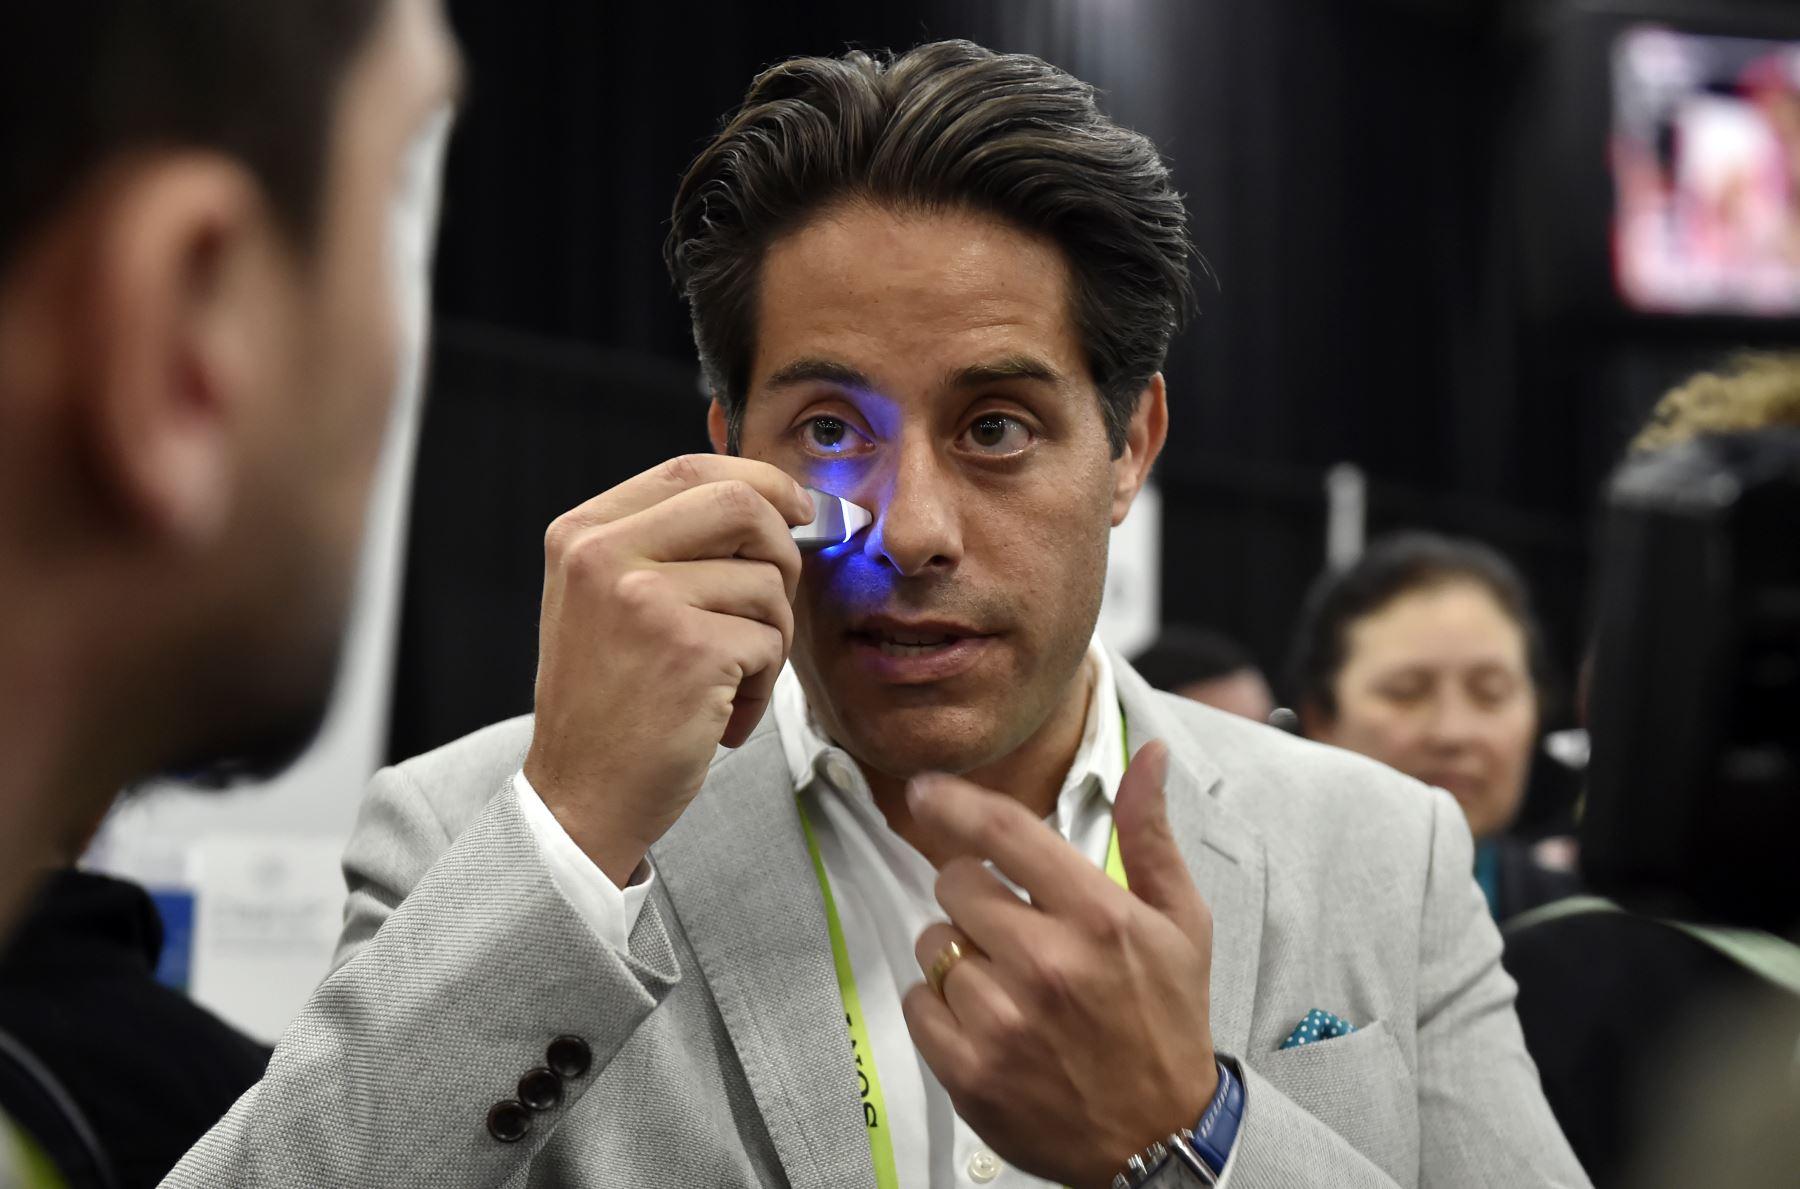 Blake Gurfein de Tivic Health Systems muestra un analgésico Clear Up sinus durante un evento de prensa para CES 2019 en Las Vegas, Nevada.  AFP